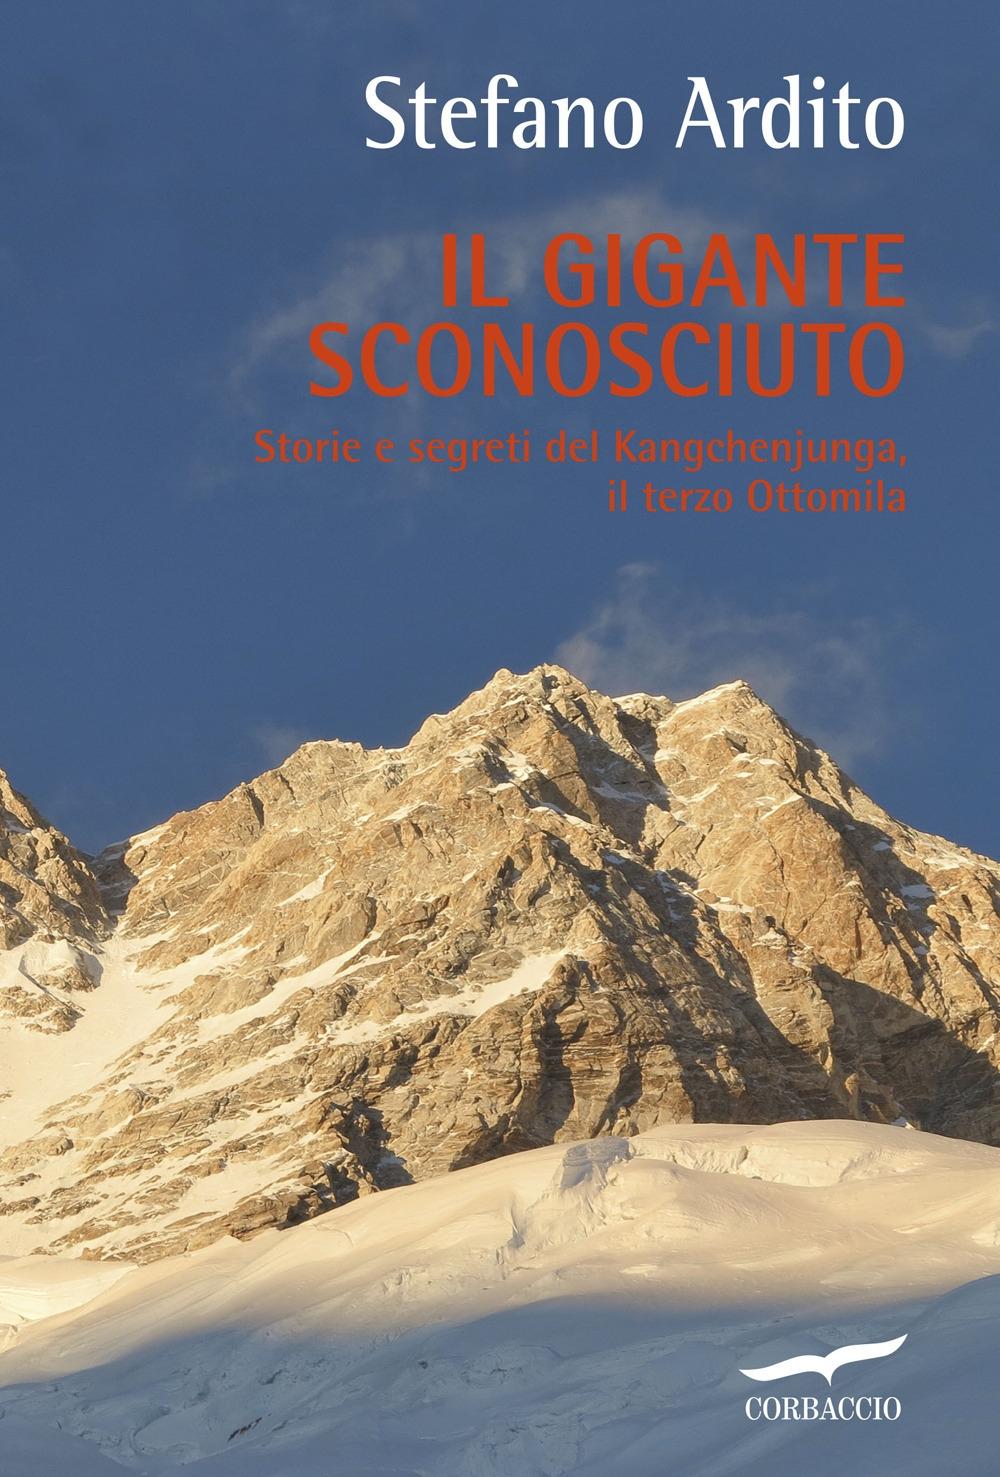 Il gigante sconosciuto. Storie e segreti del Kangchenjunga, il terzo Ottomila.